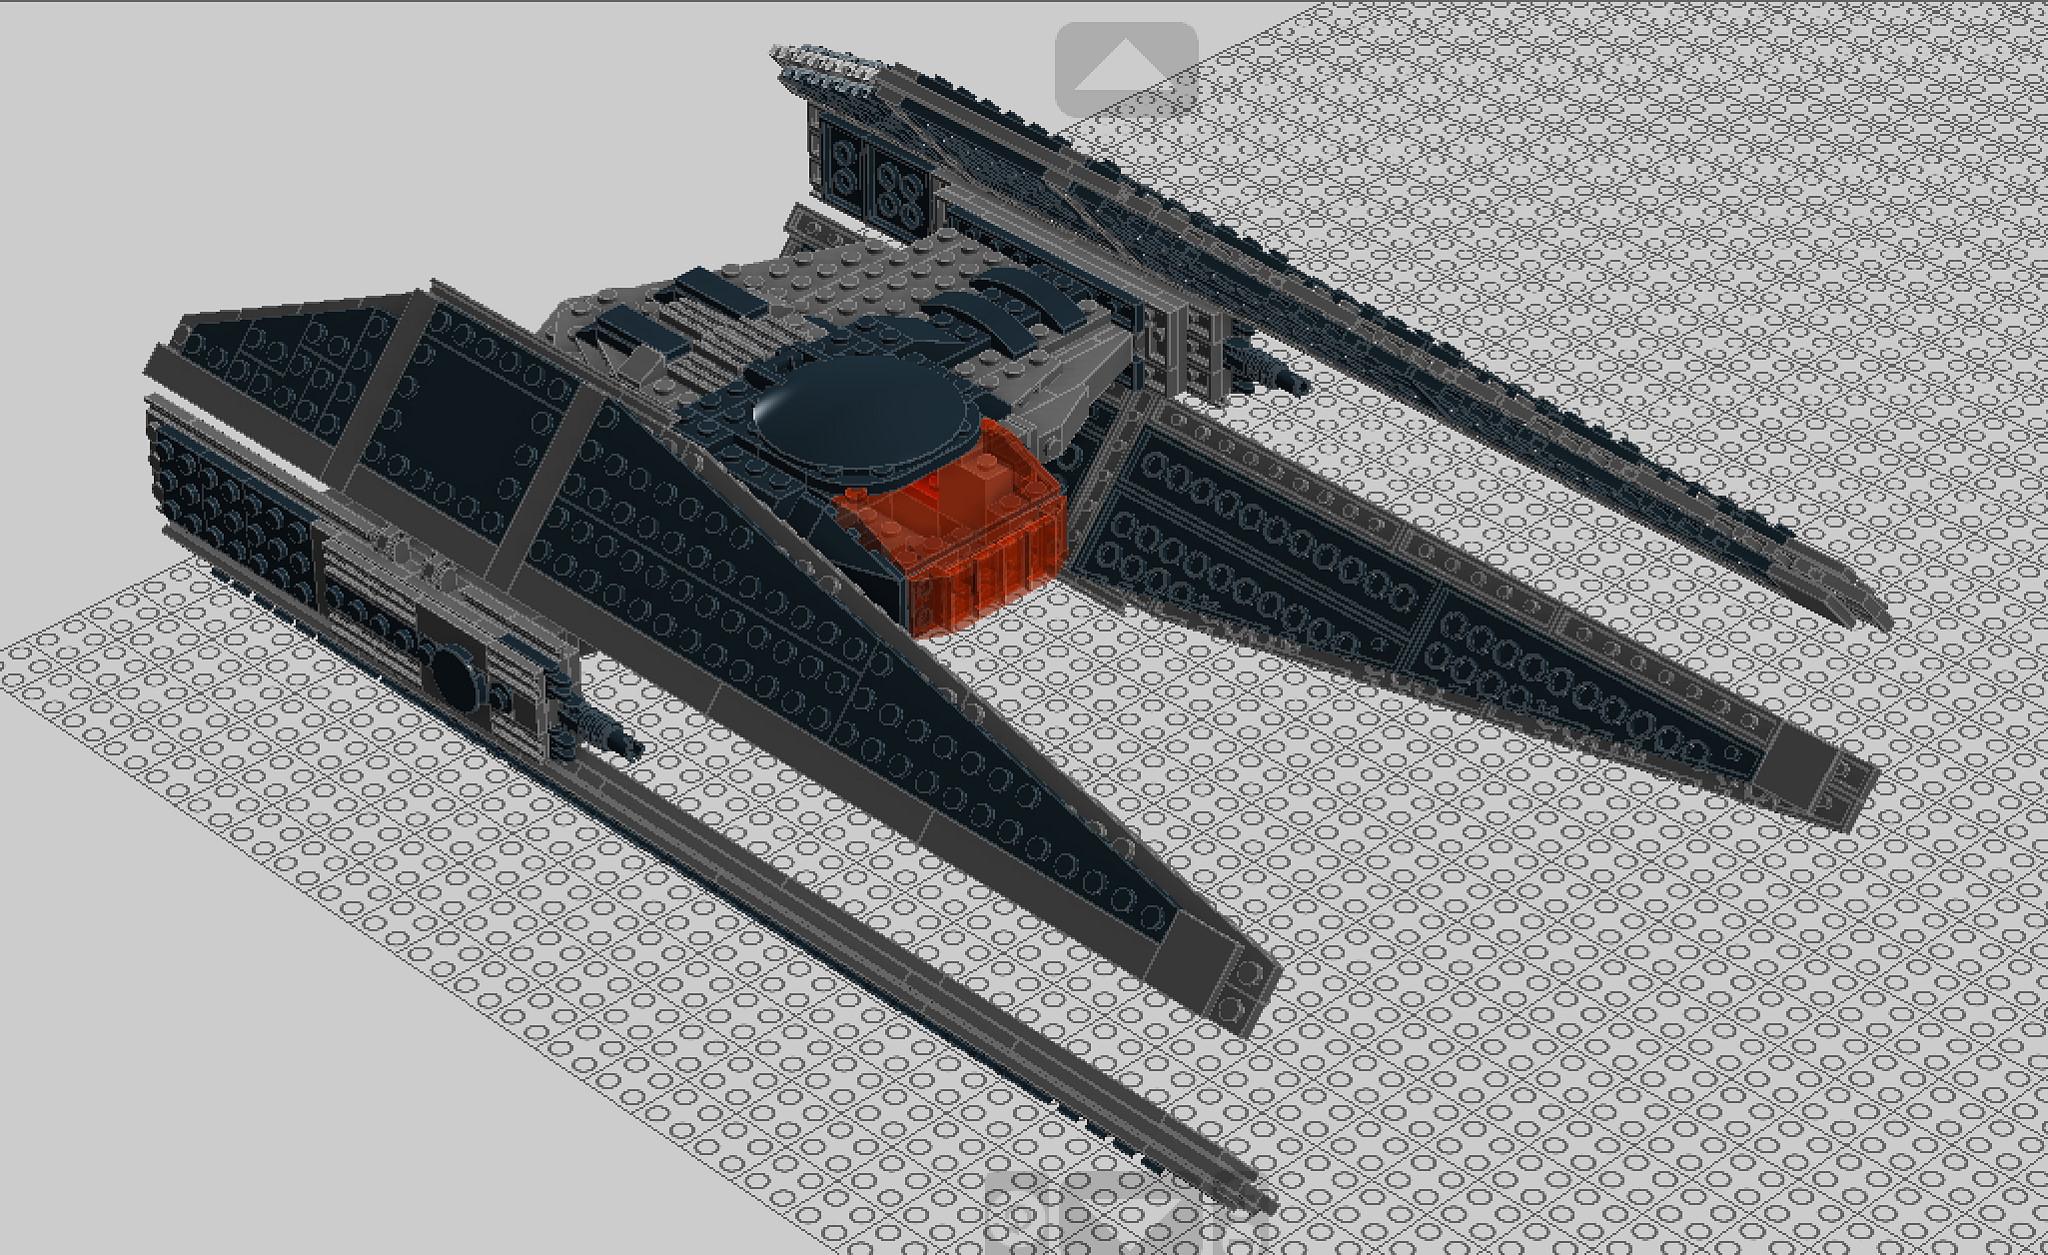 tie silencer lego photo - 1